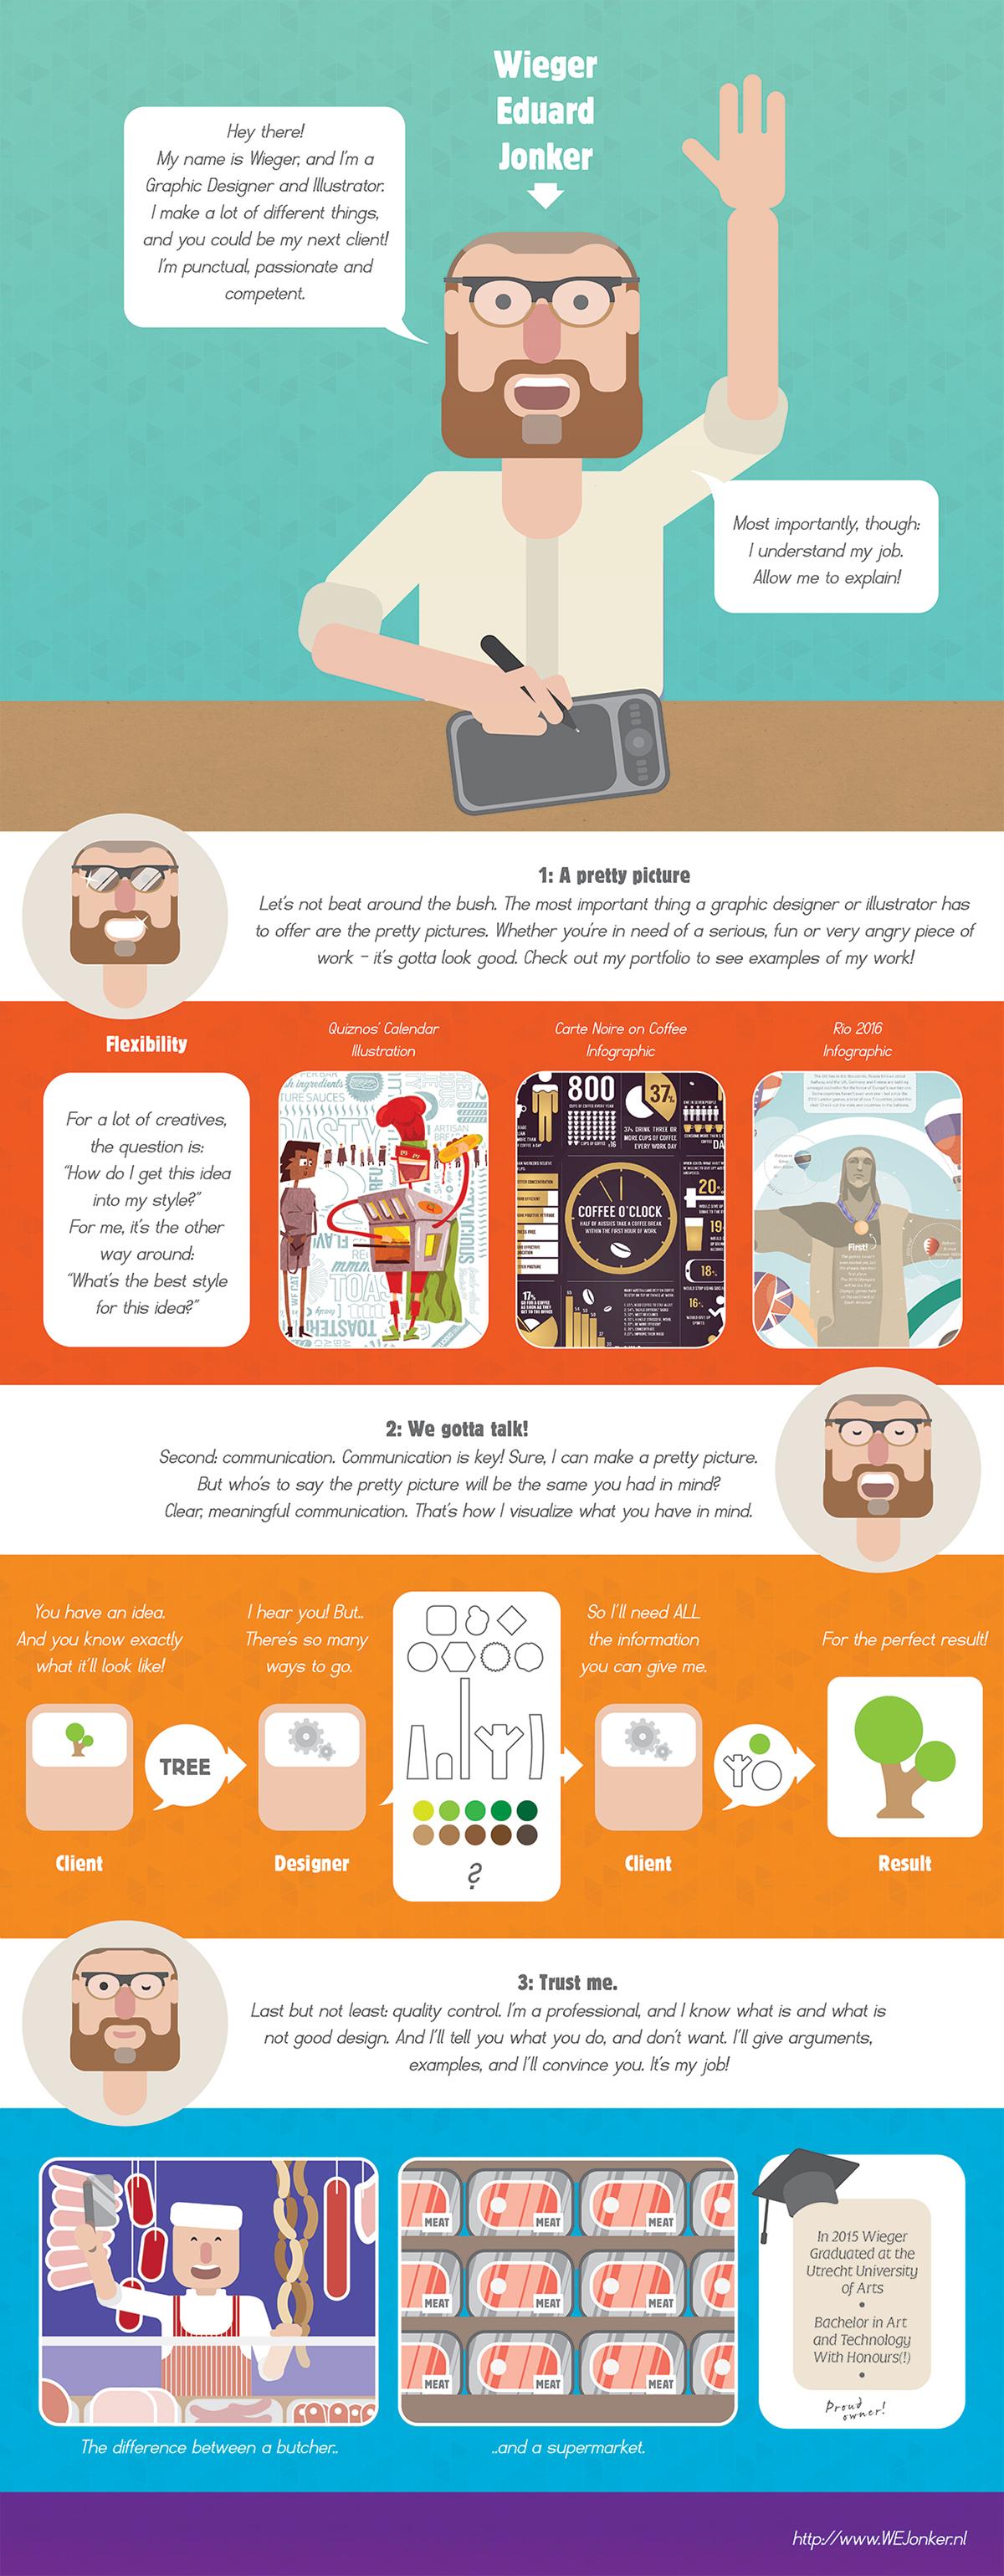 Infographic WEJonker